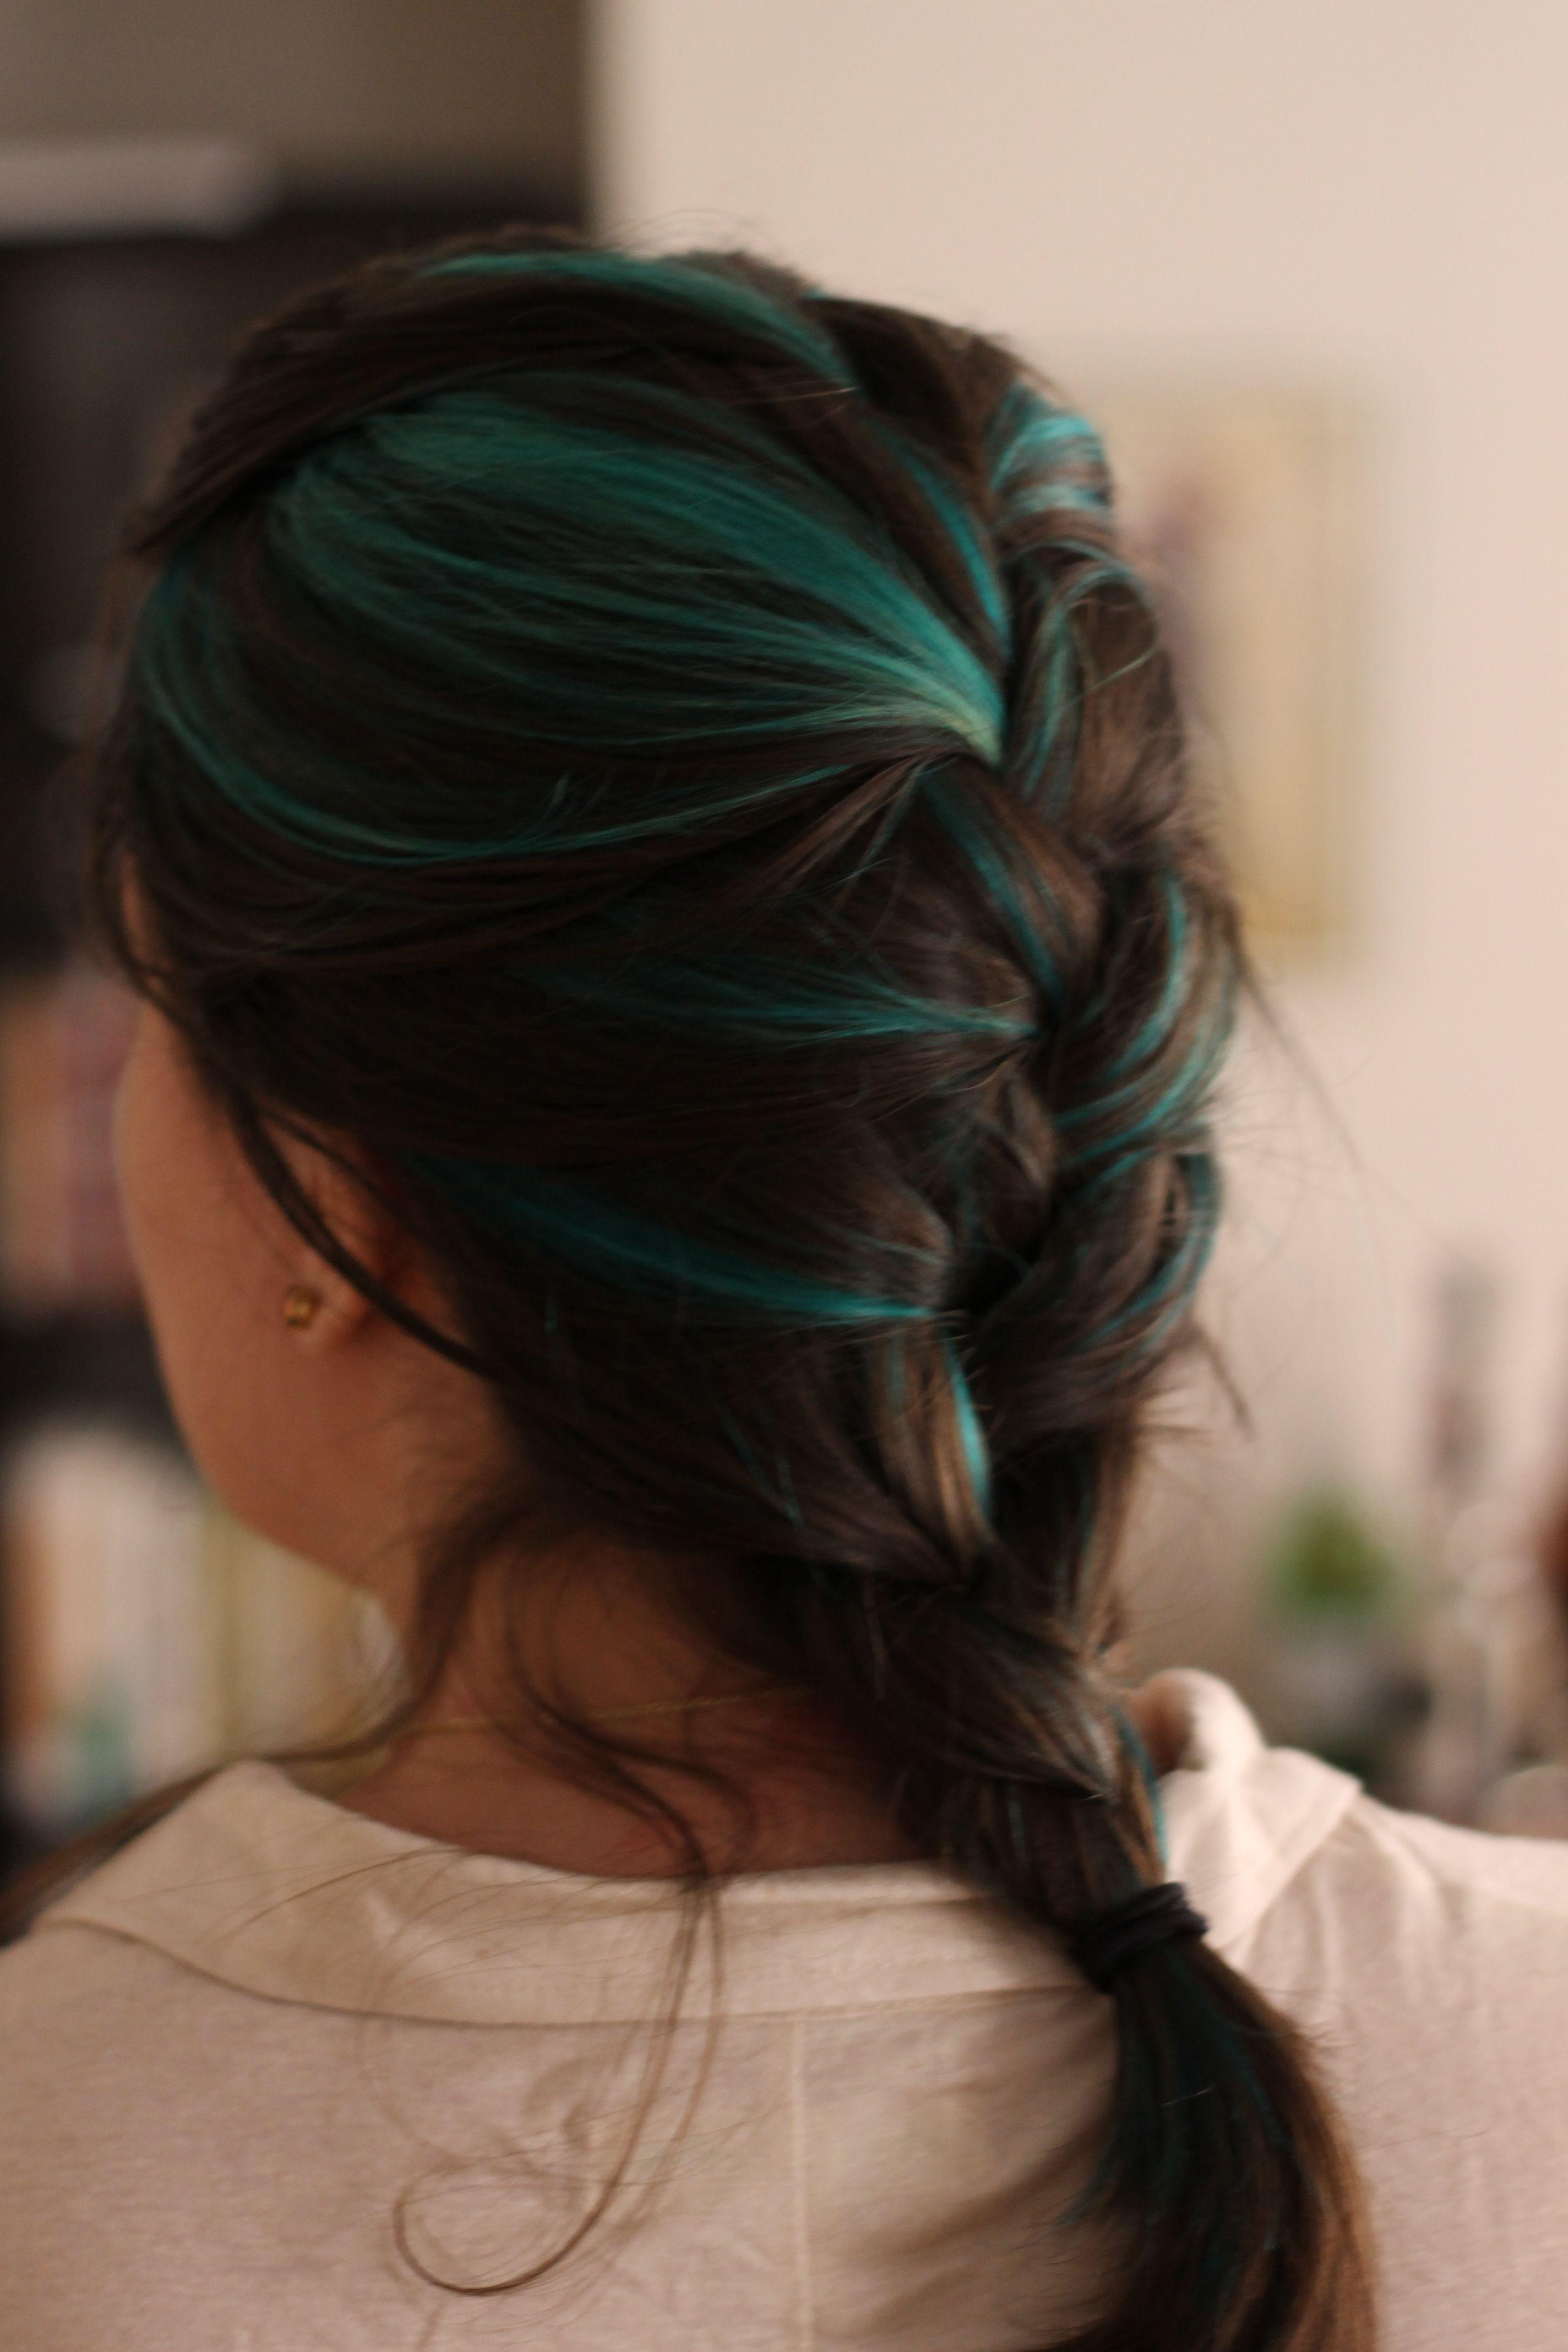 Teal hair streaks, with turquoise ends loveeeee this